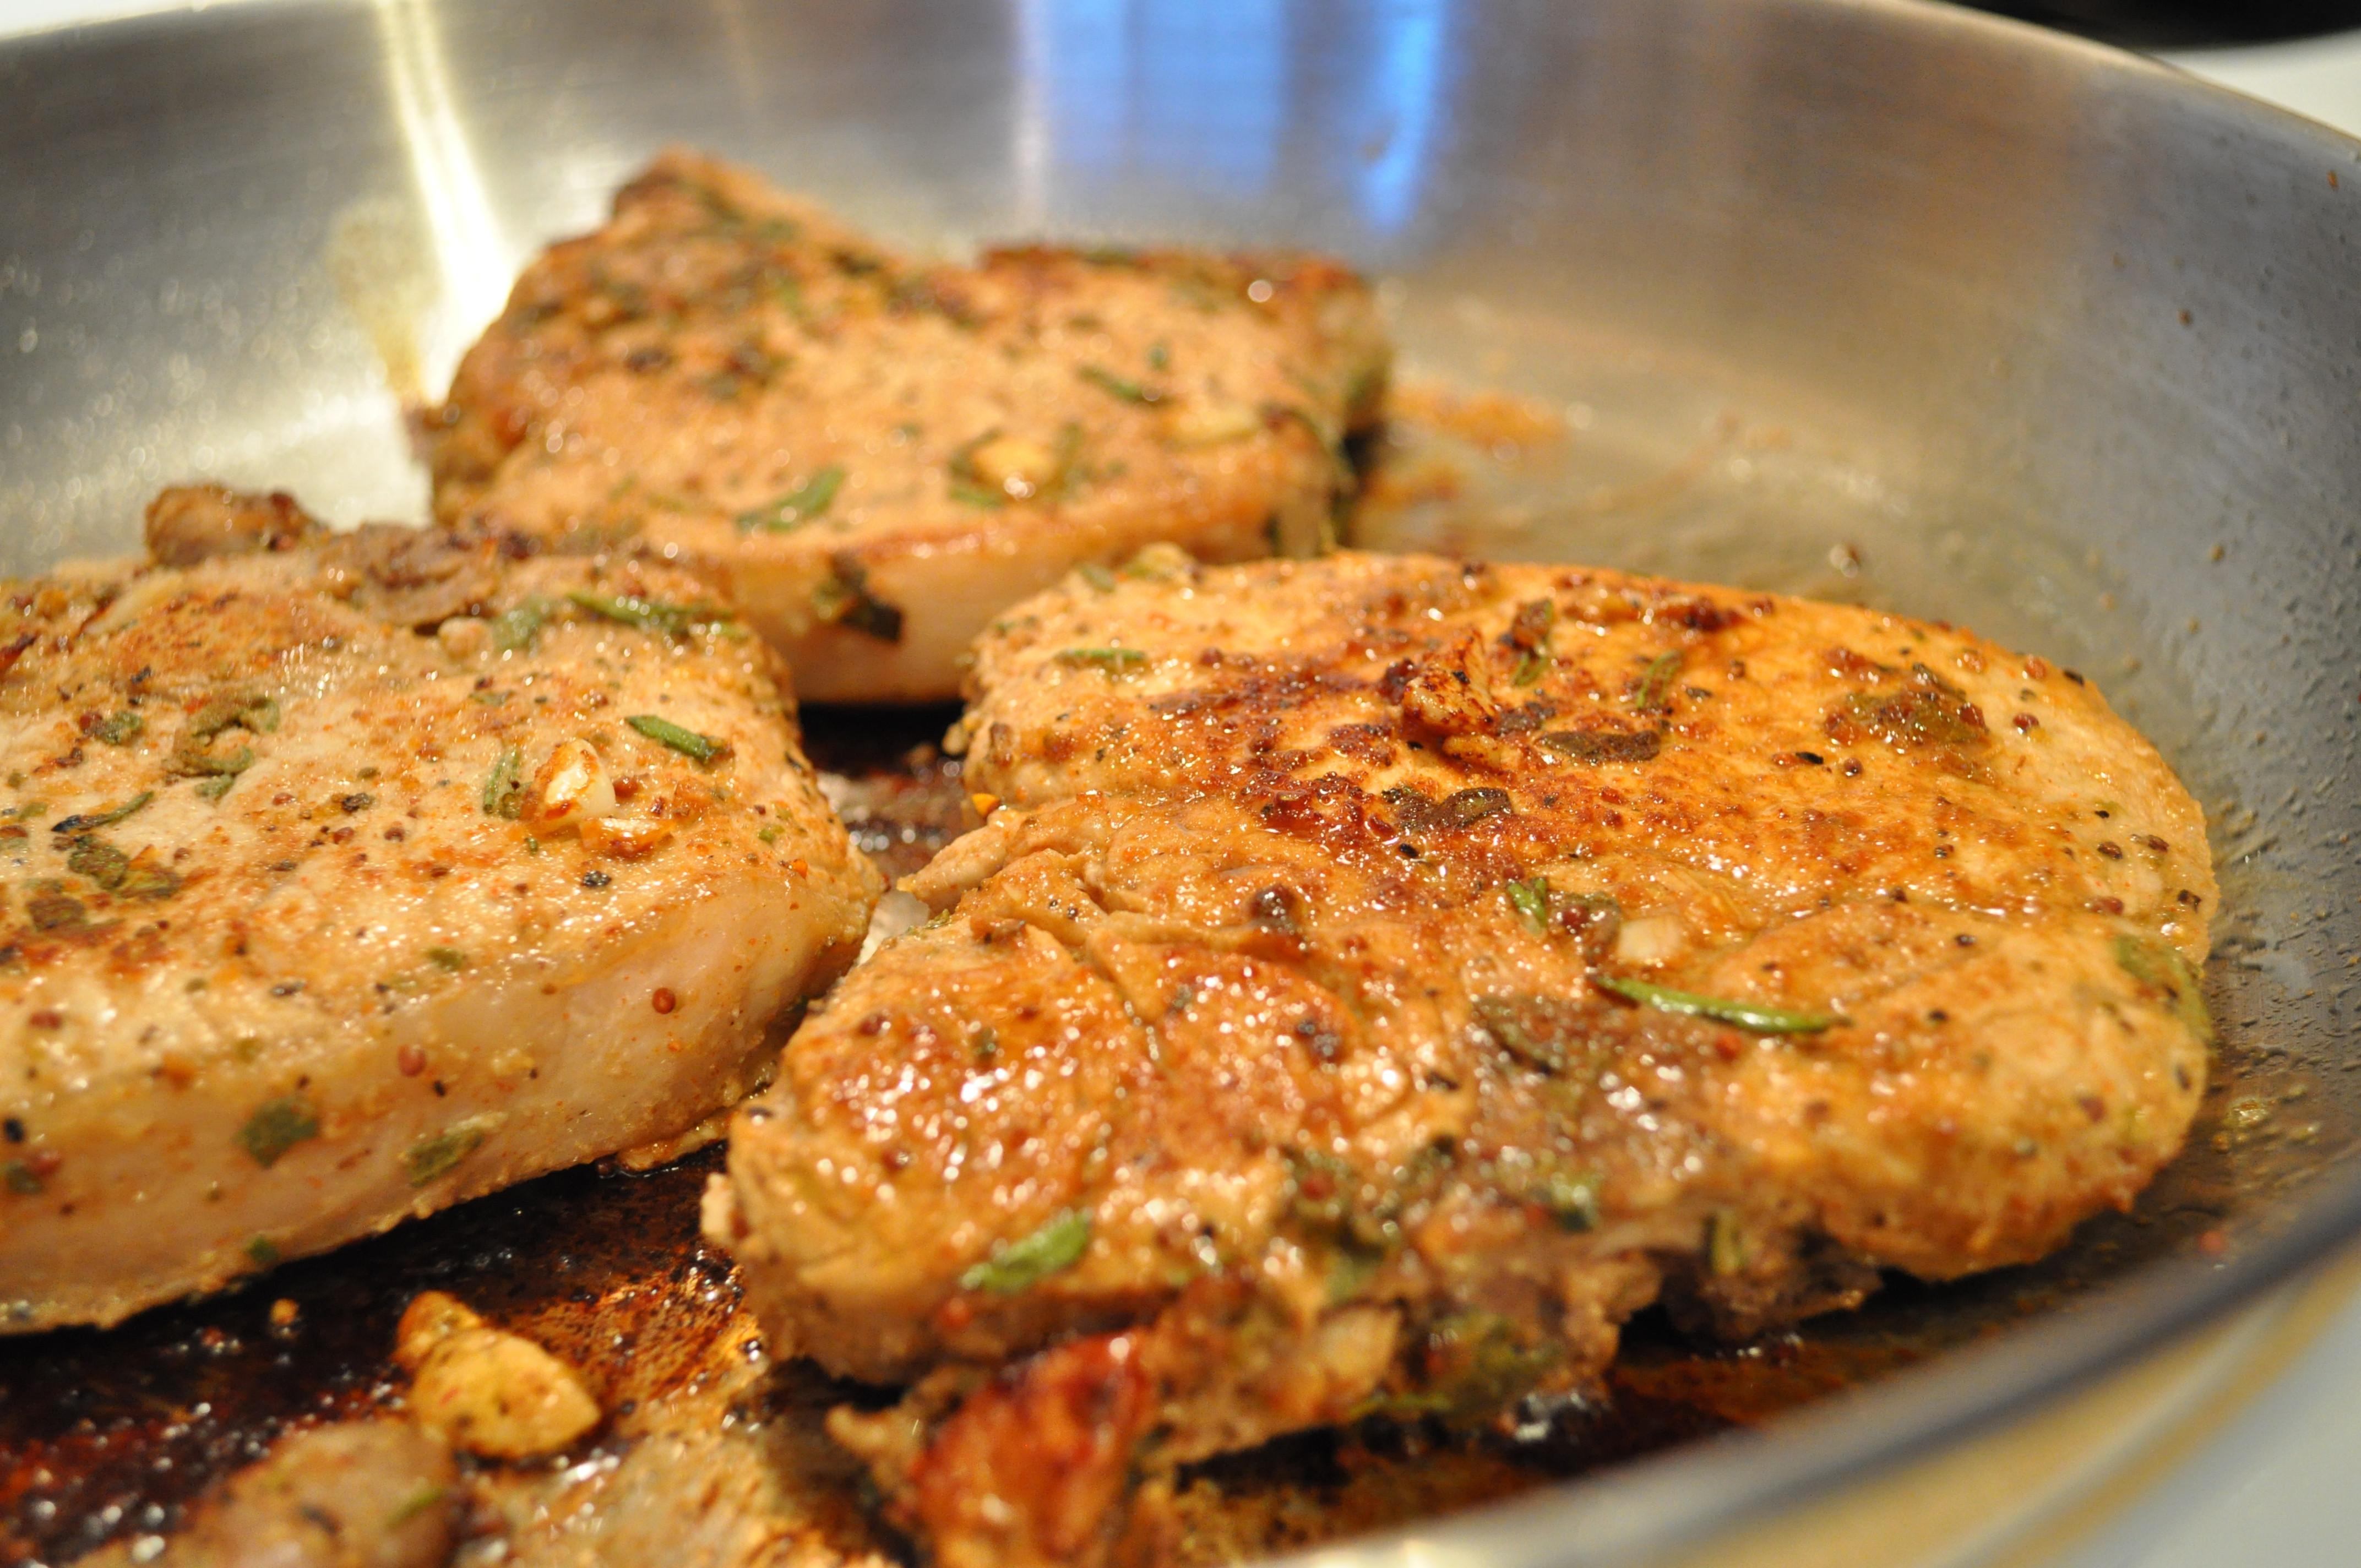 How Long To Pan Fry Pork Chops  Pan Fried Pork Chops & Roasted Ve ables – gluten free zen